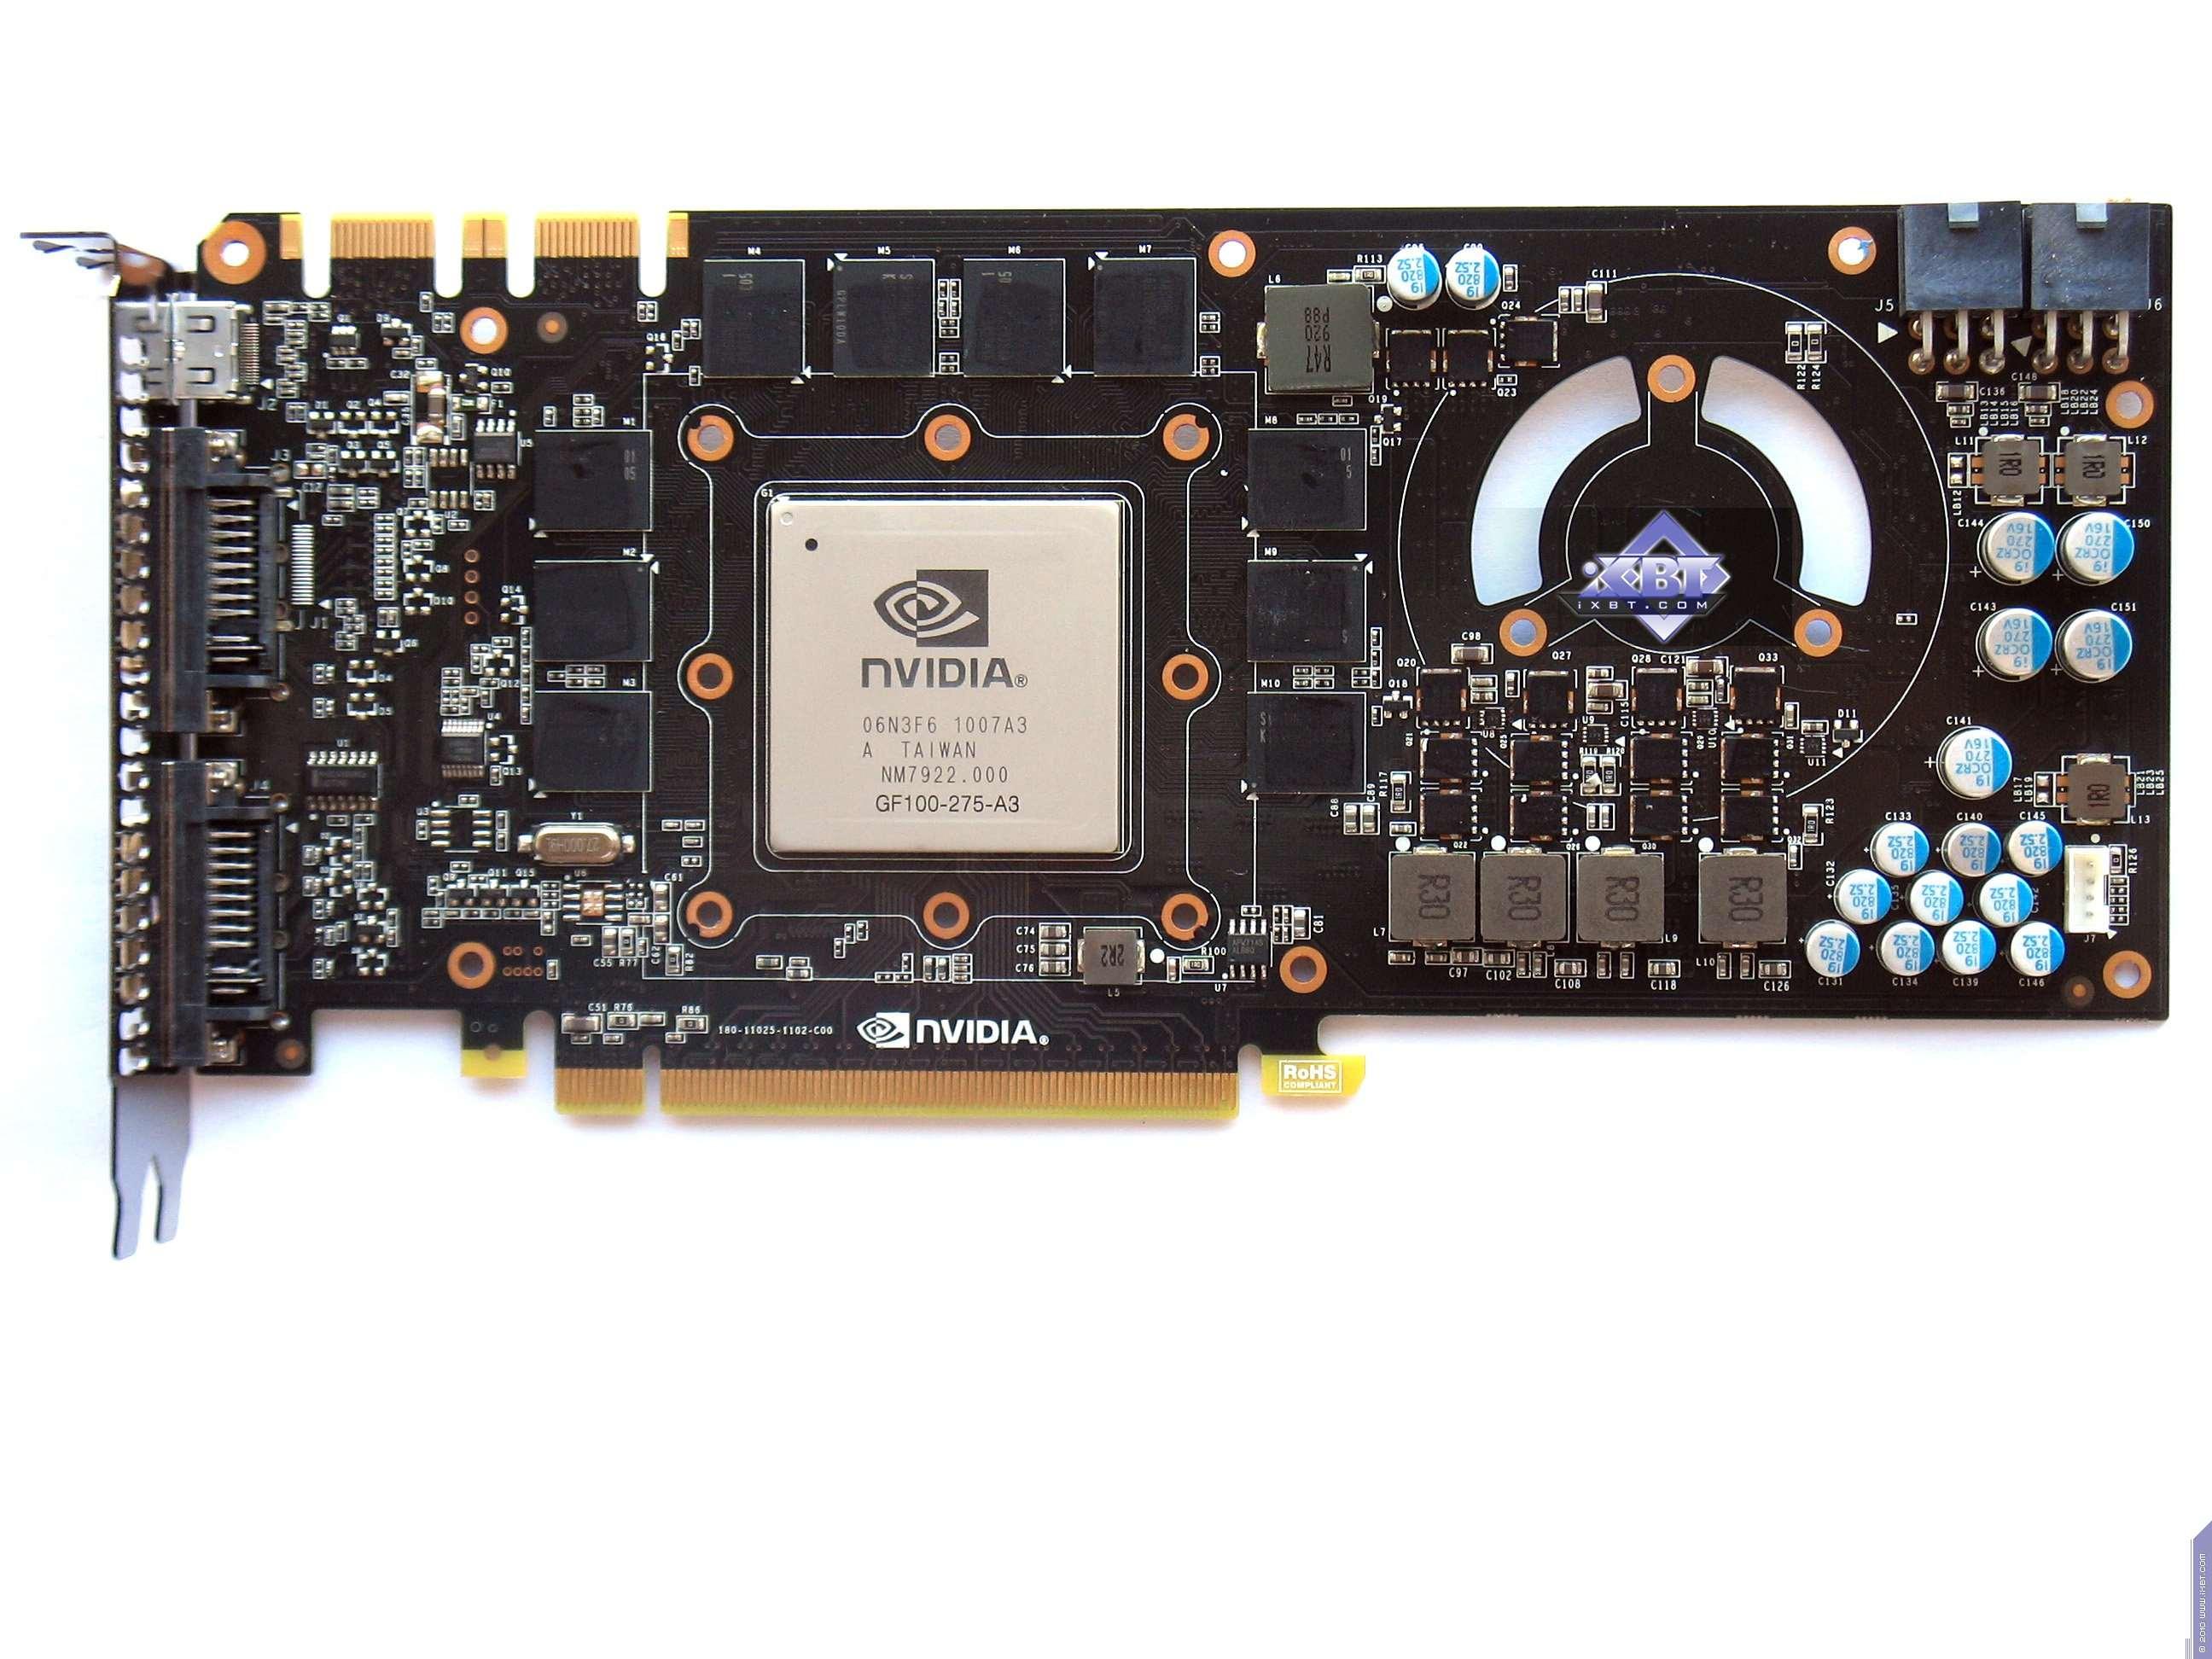 iXBT Labs - Palit GeForce GTX 470 1280MB GDDR5 Graphics Card